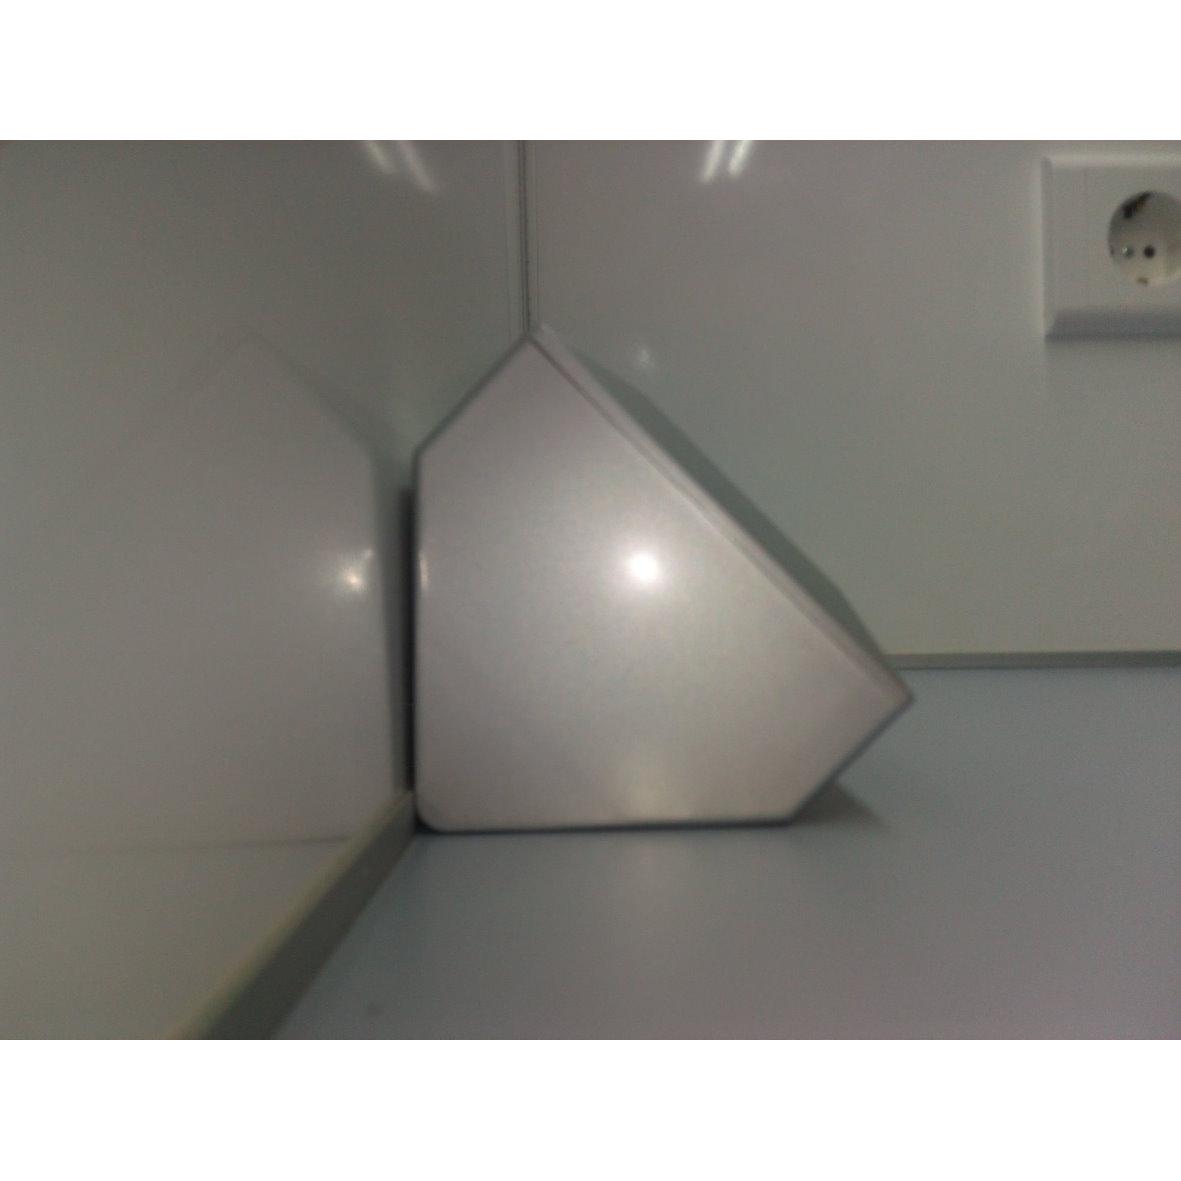 Aufbausteckdose Küche | Aufbau Steckdose 3 Fach Silber 21666